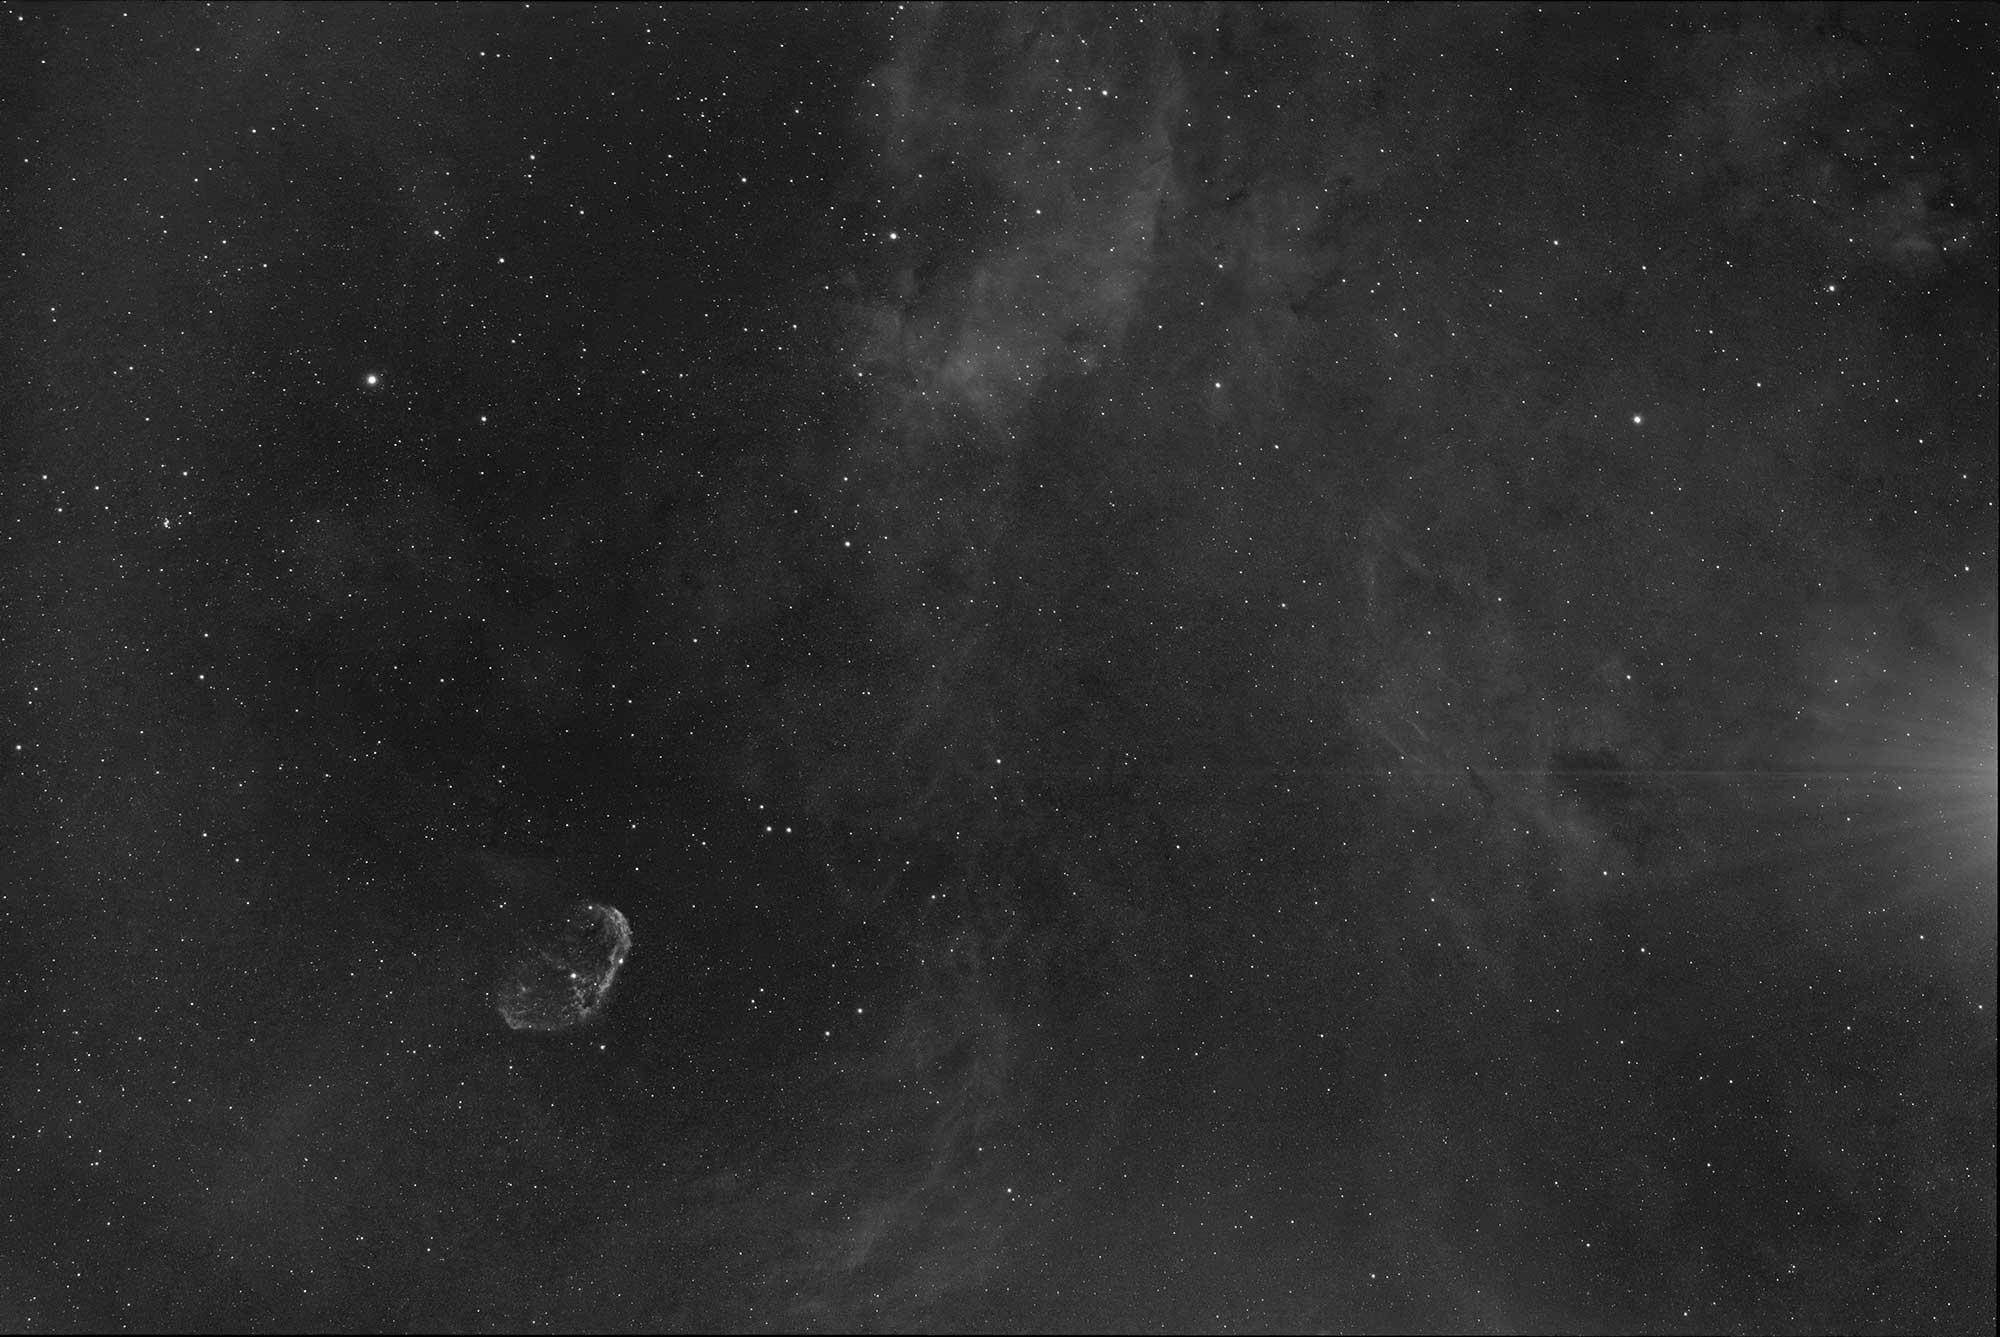 RASA8 telescope on the Avalon Instruments M Zero mount